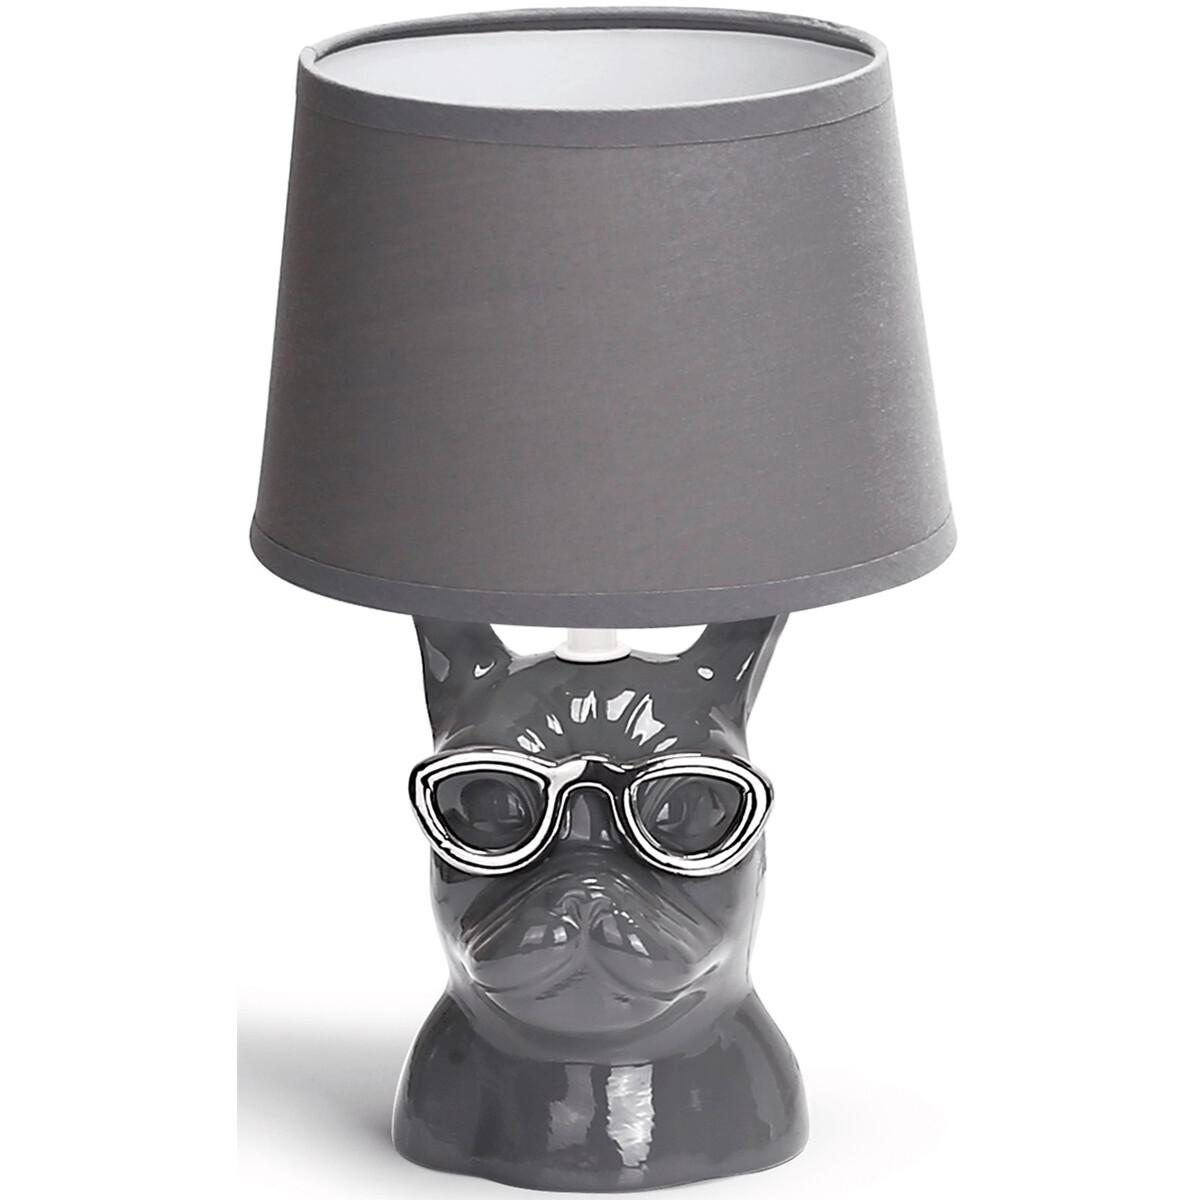 LED Tafellamp - Tafelverlichting - Aigi Xinus - E14 Fitting - Rond - Mat Grijs - Keramiek